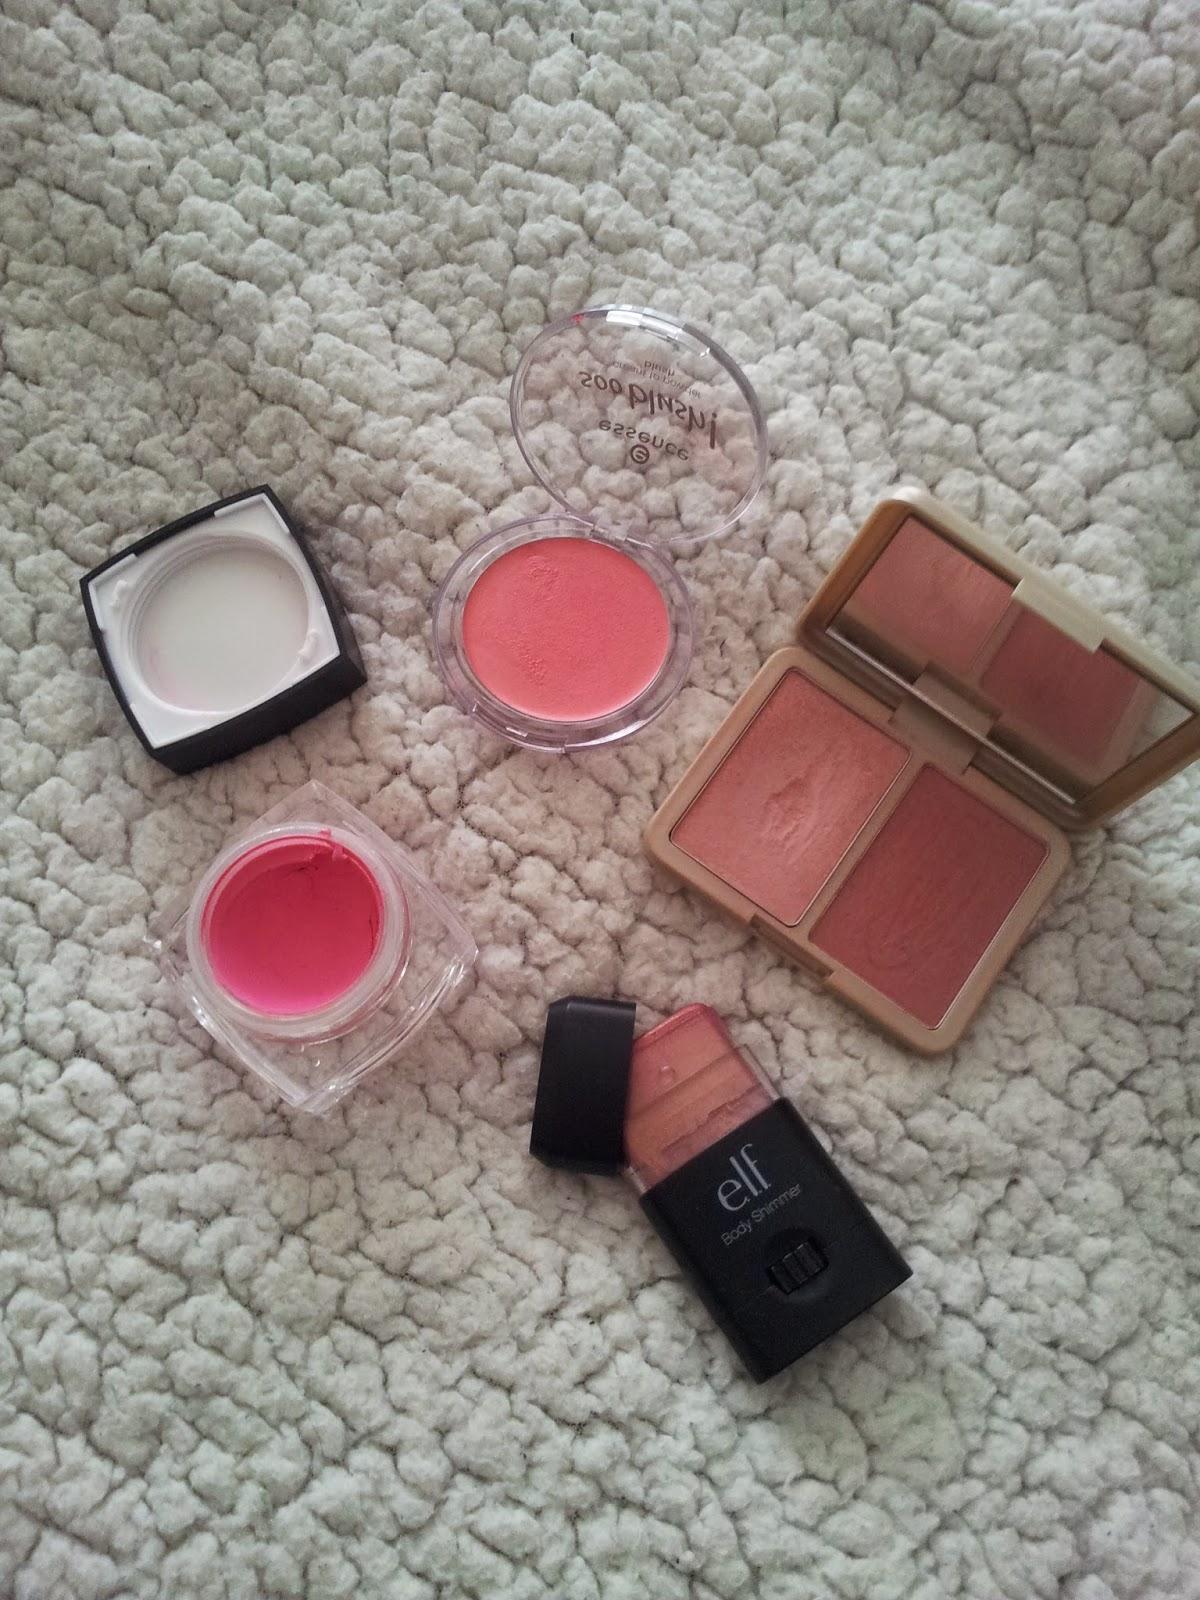 blush-maquillage-test-rose